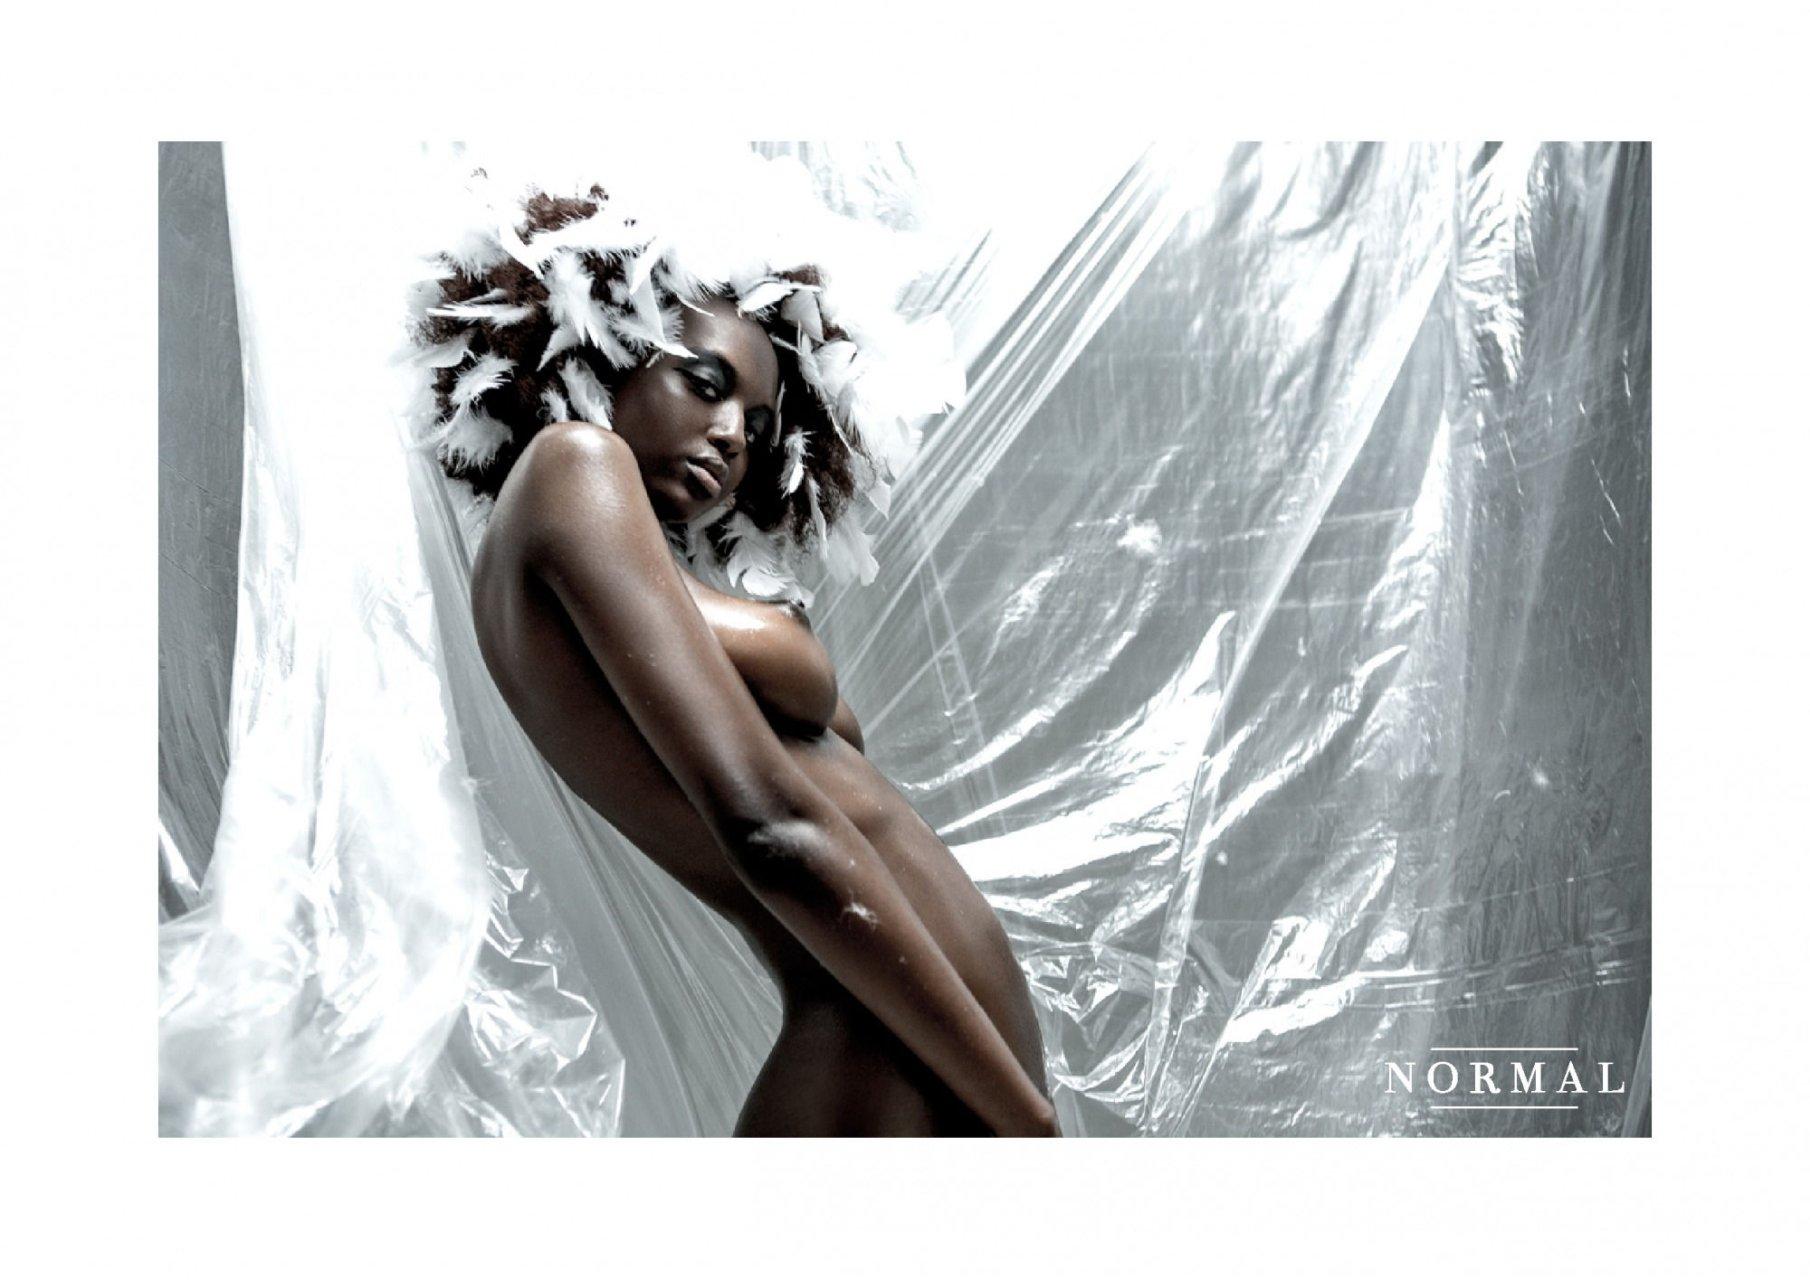 Watch Mahreeyam jah topless video